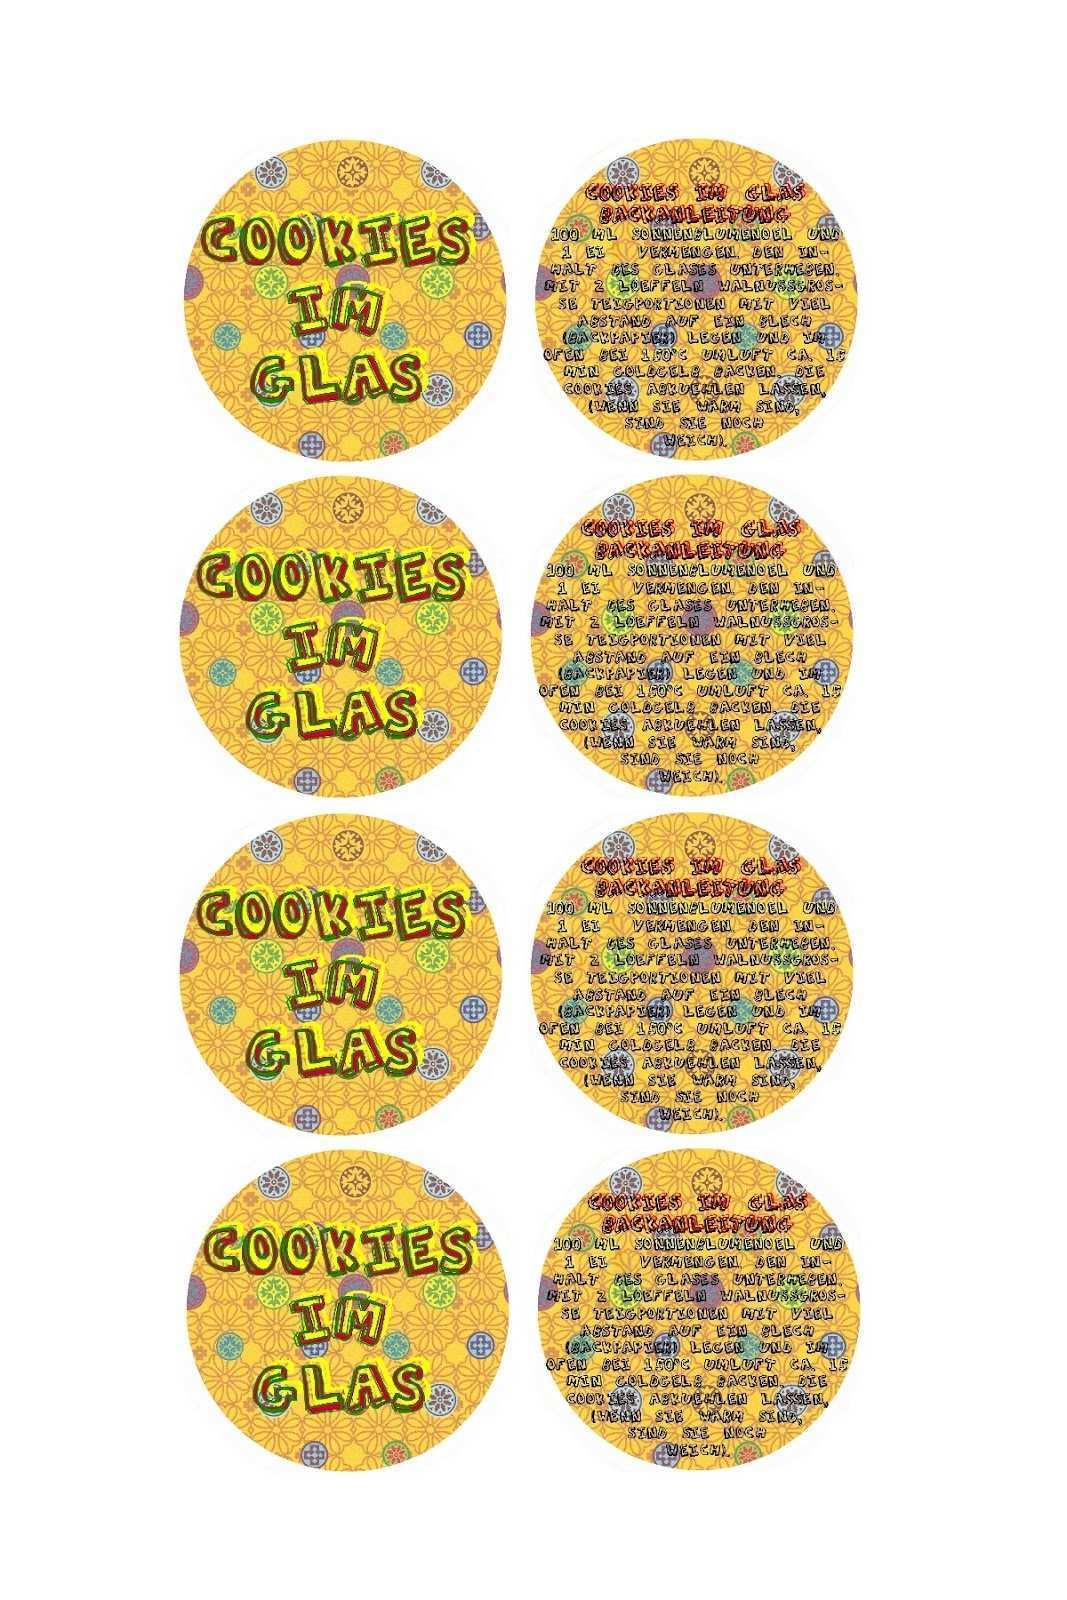 Frelikat Vorlage Etikett Cookies Im Glas